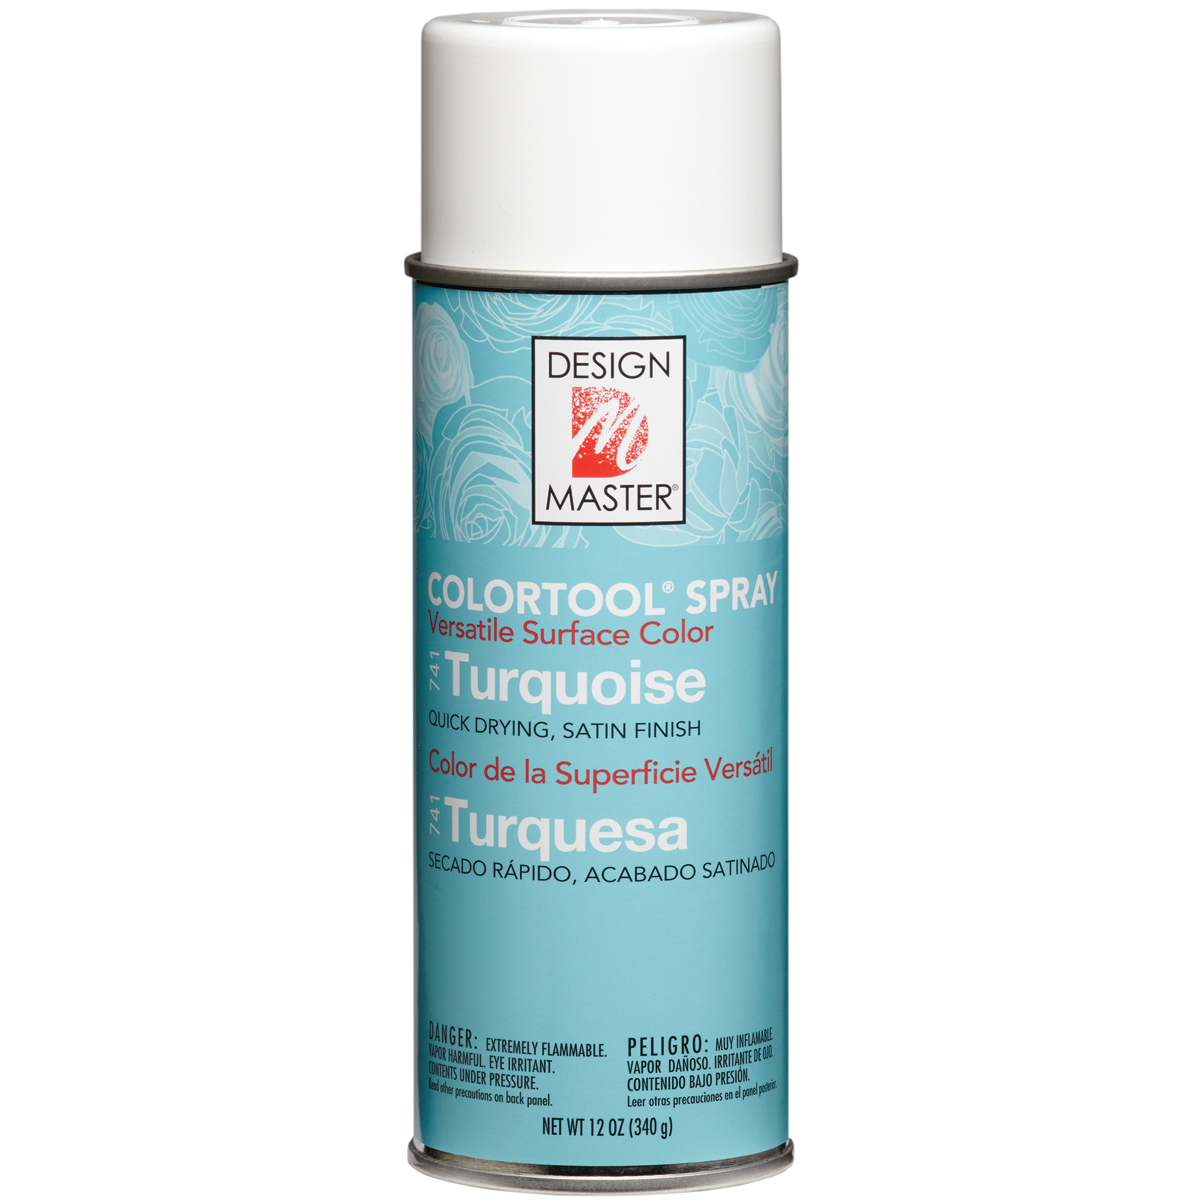 Colortool Spray Paint 12oz-Turquoise